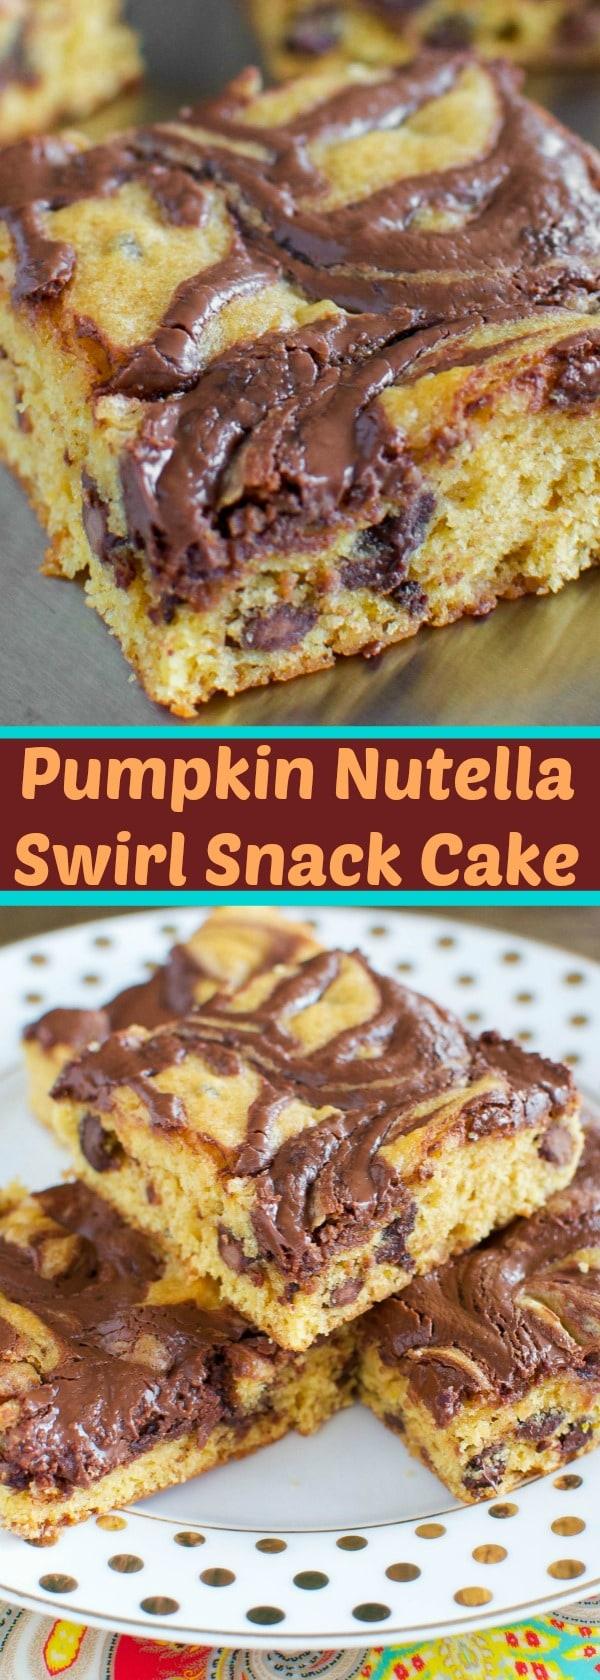 Nutella Pumpkin Swirl Snack Cake